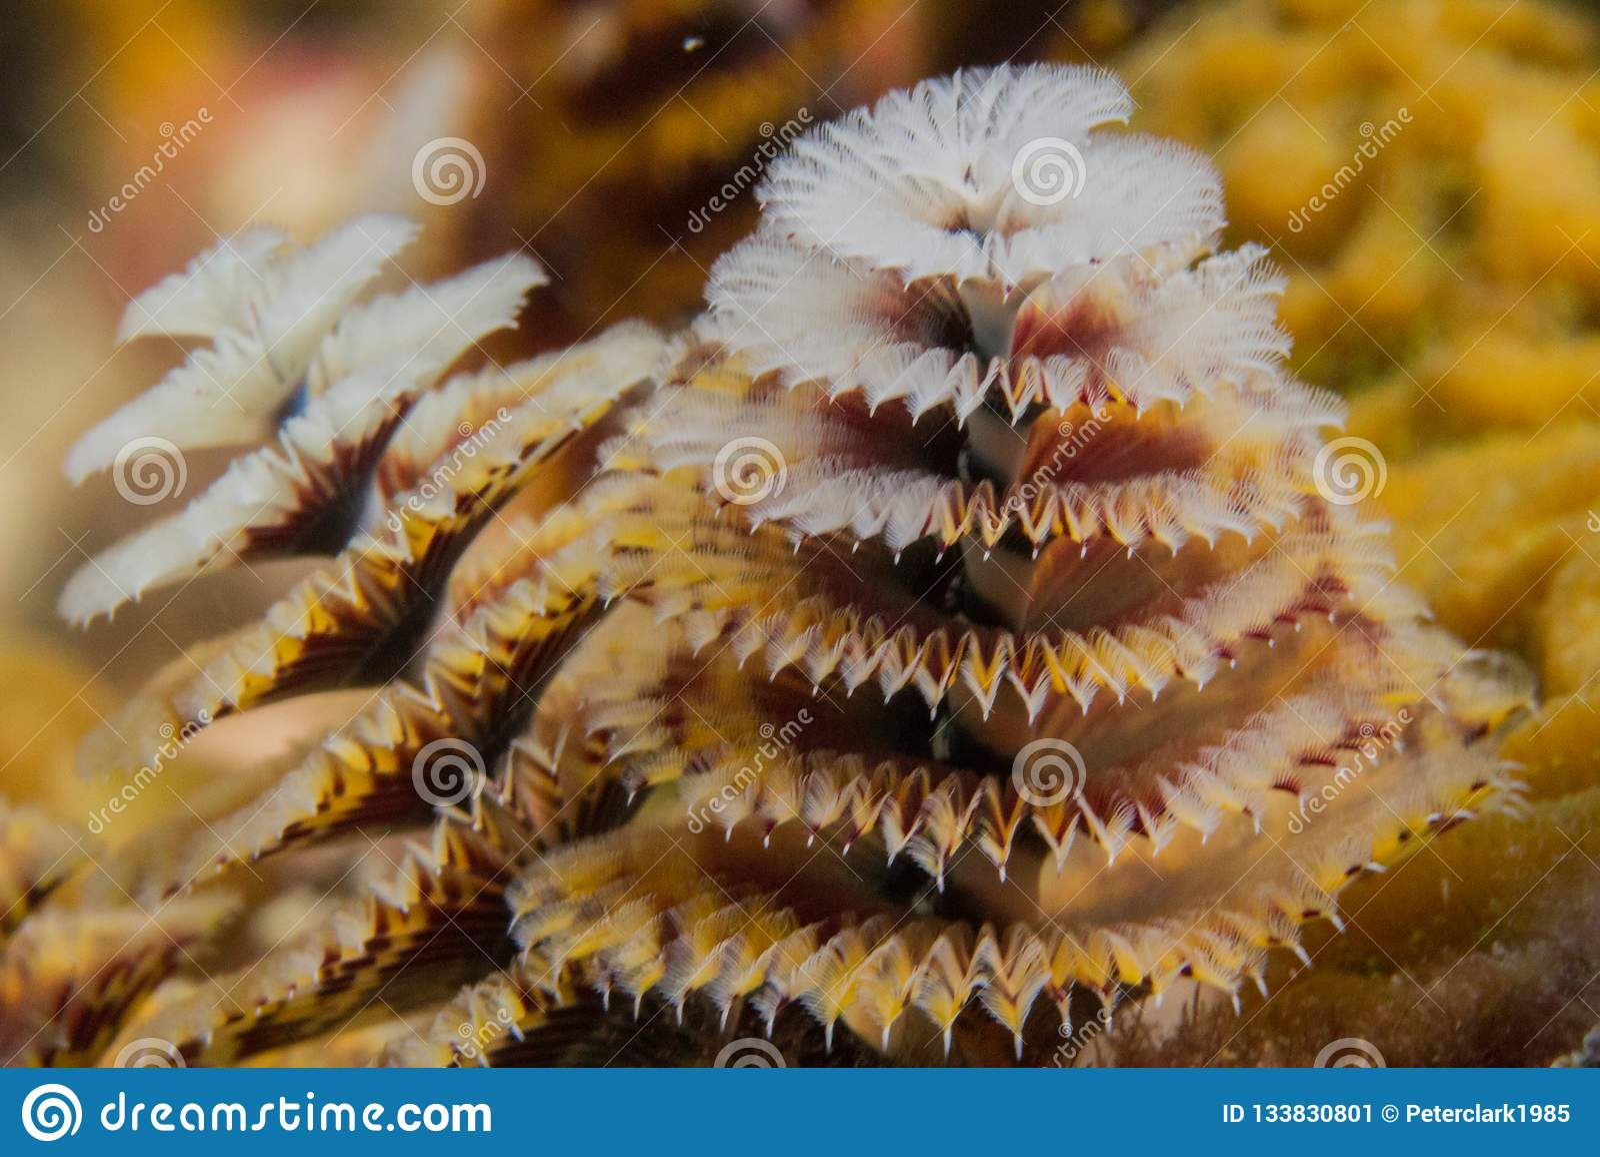 Christmas In Florida Keys.Christmas Tree Worm On Coral Reef Stock Image Image Of